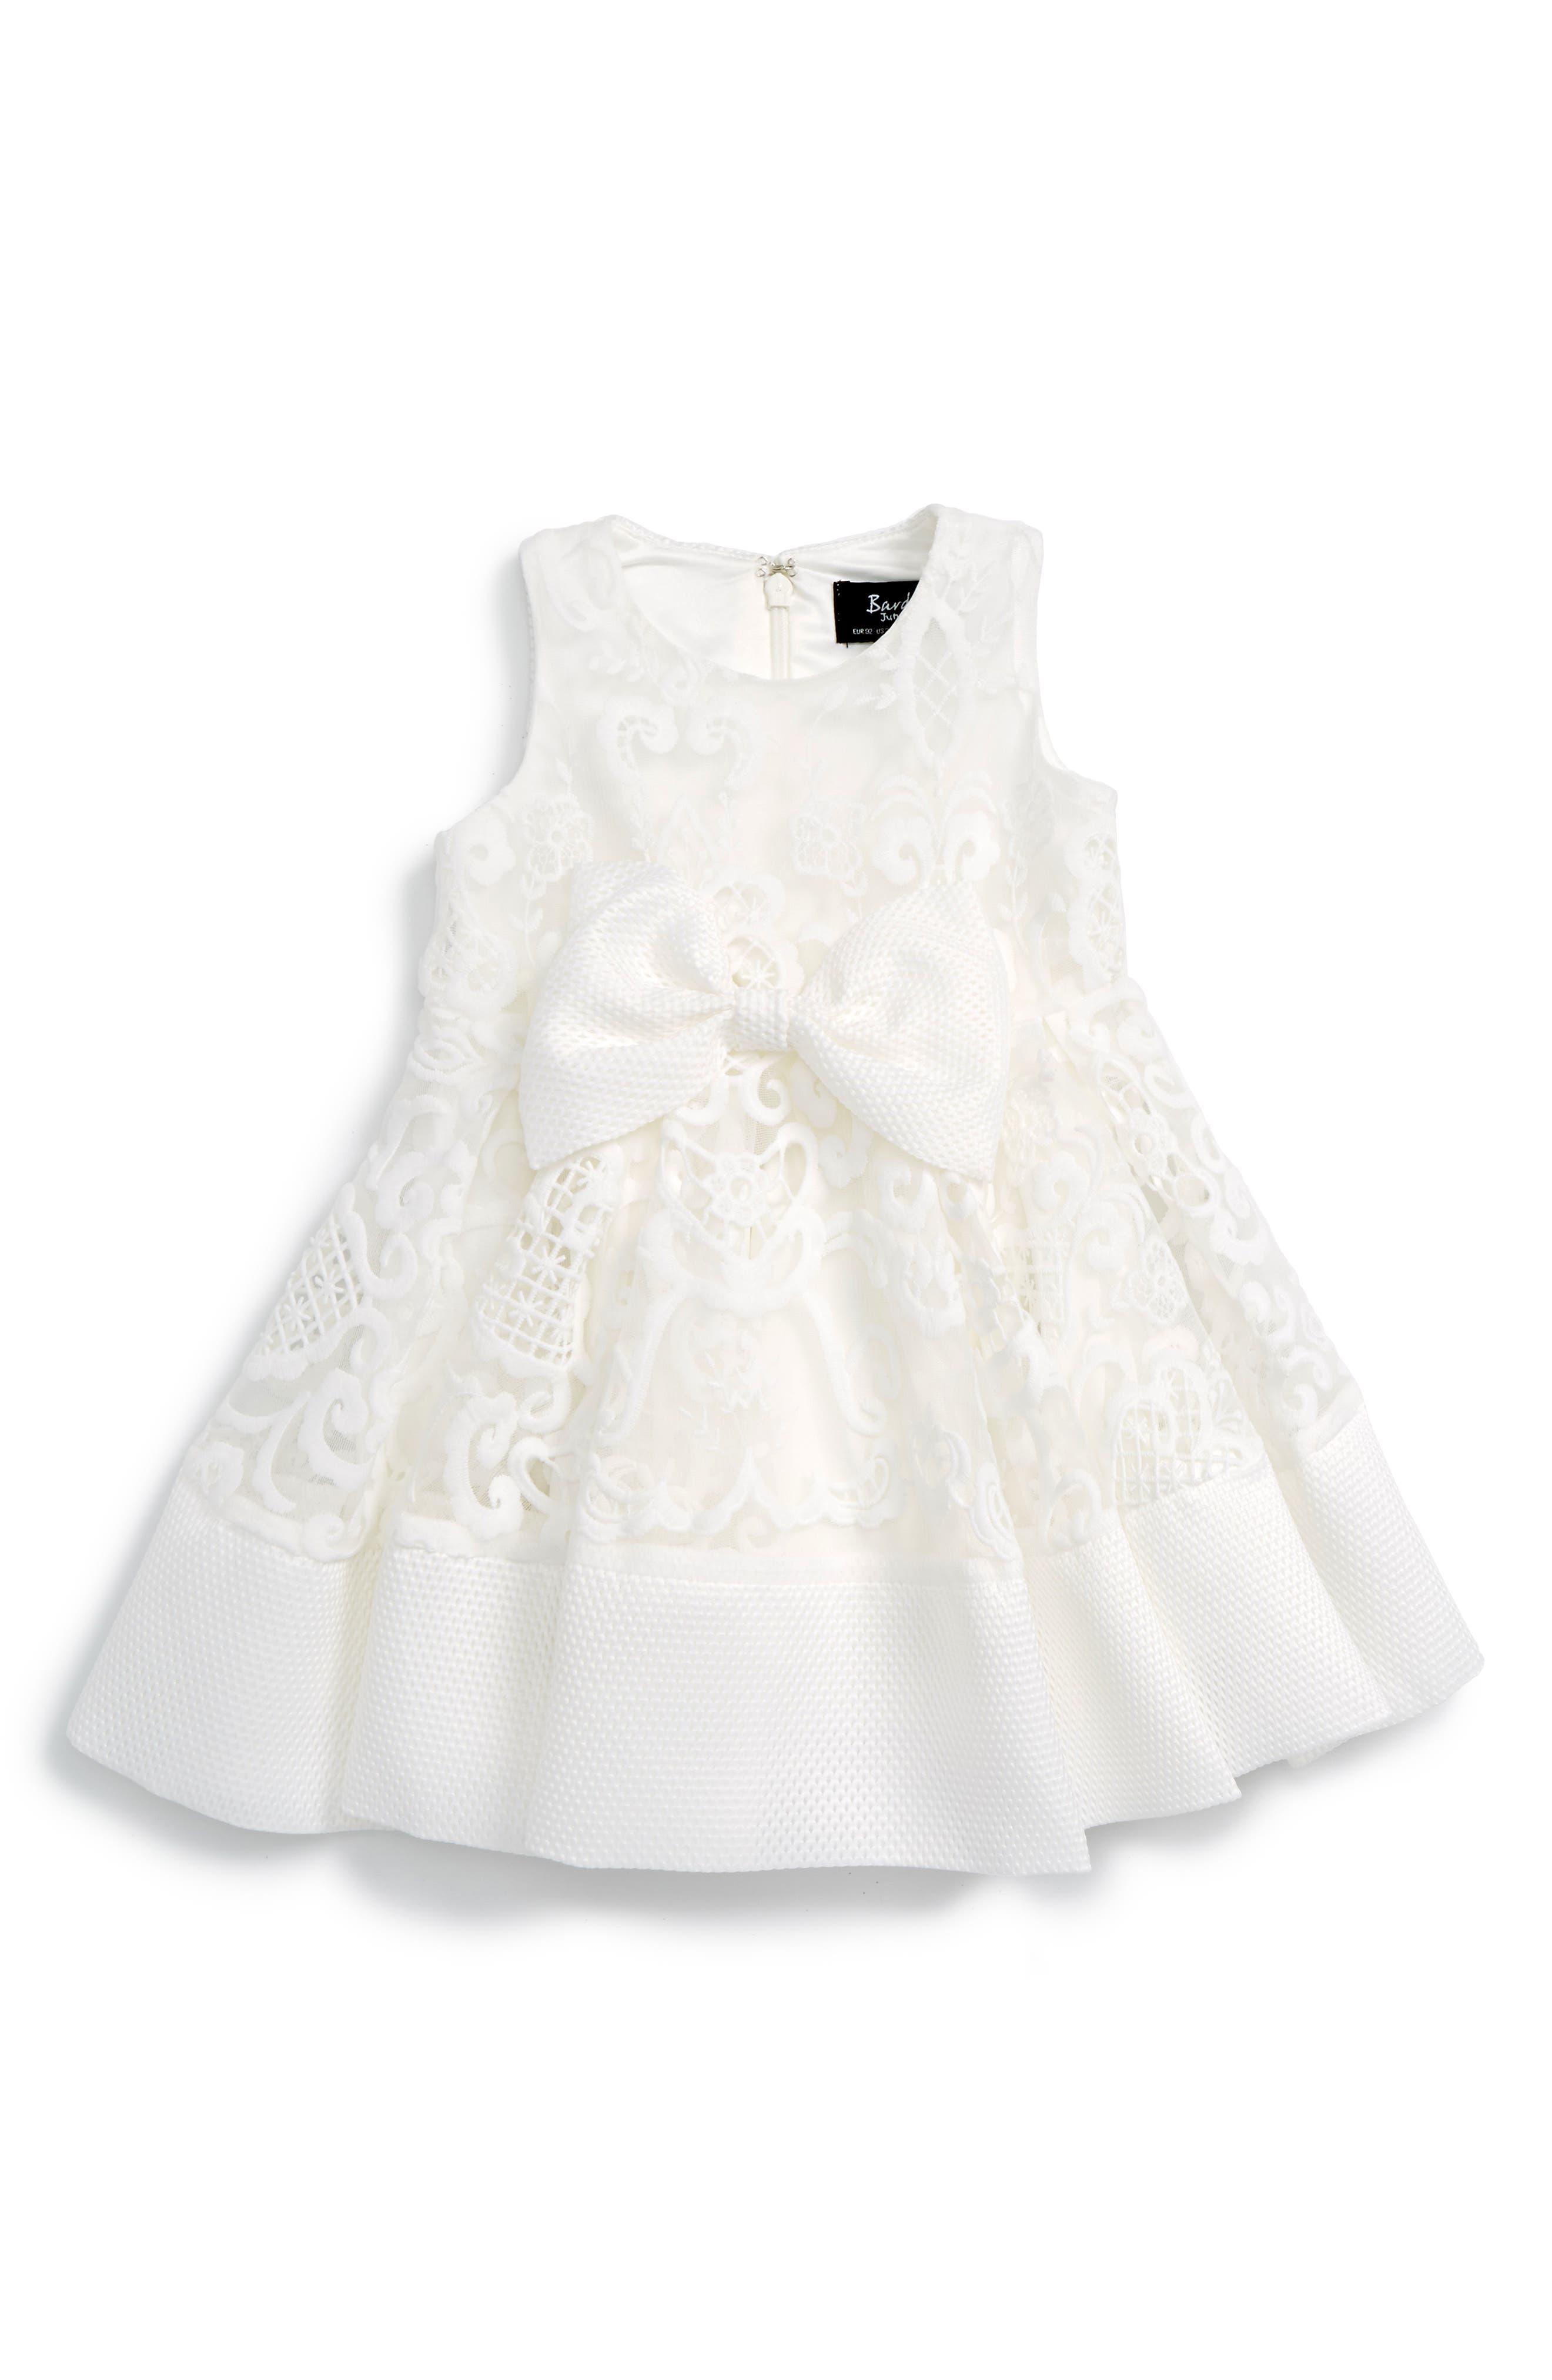 Ana Starlet Dress,                             Alternate thumbnail 2, color,                             907